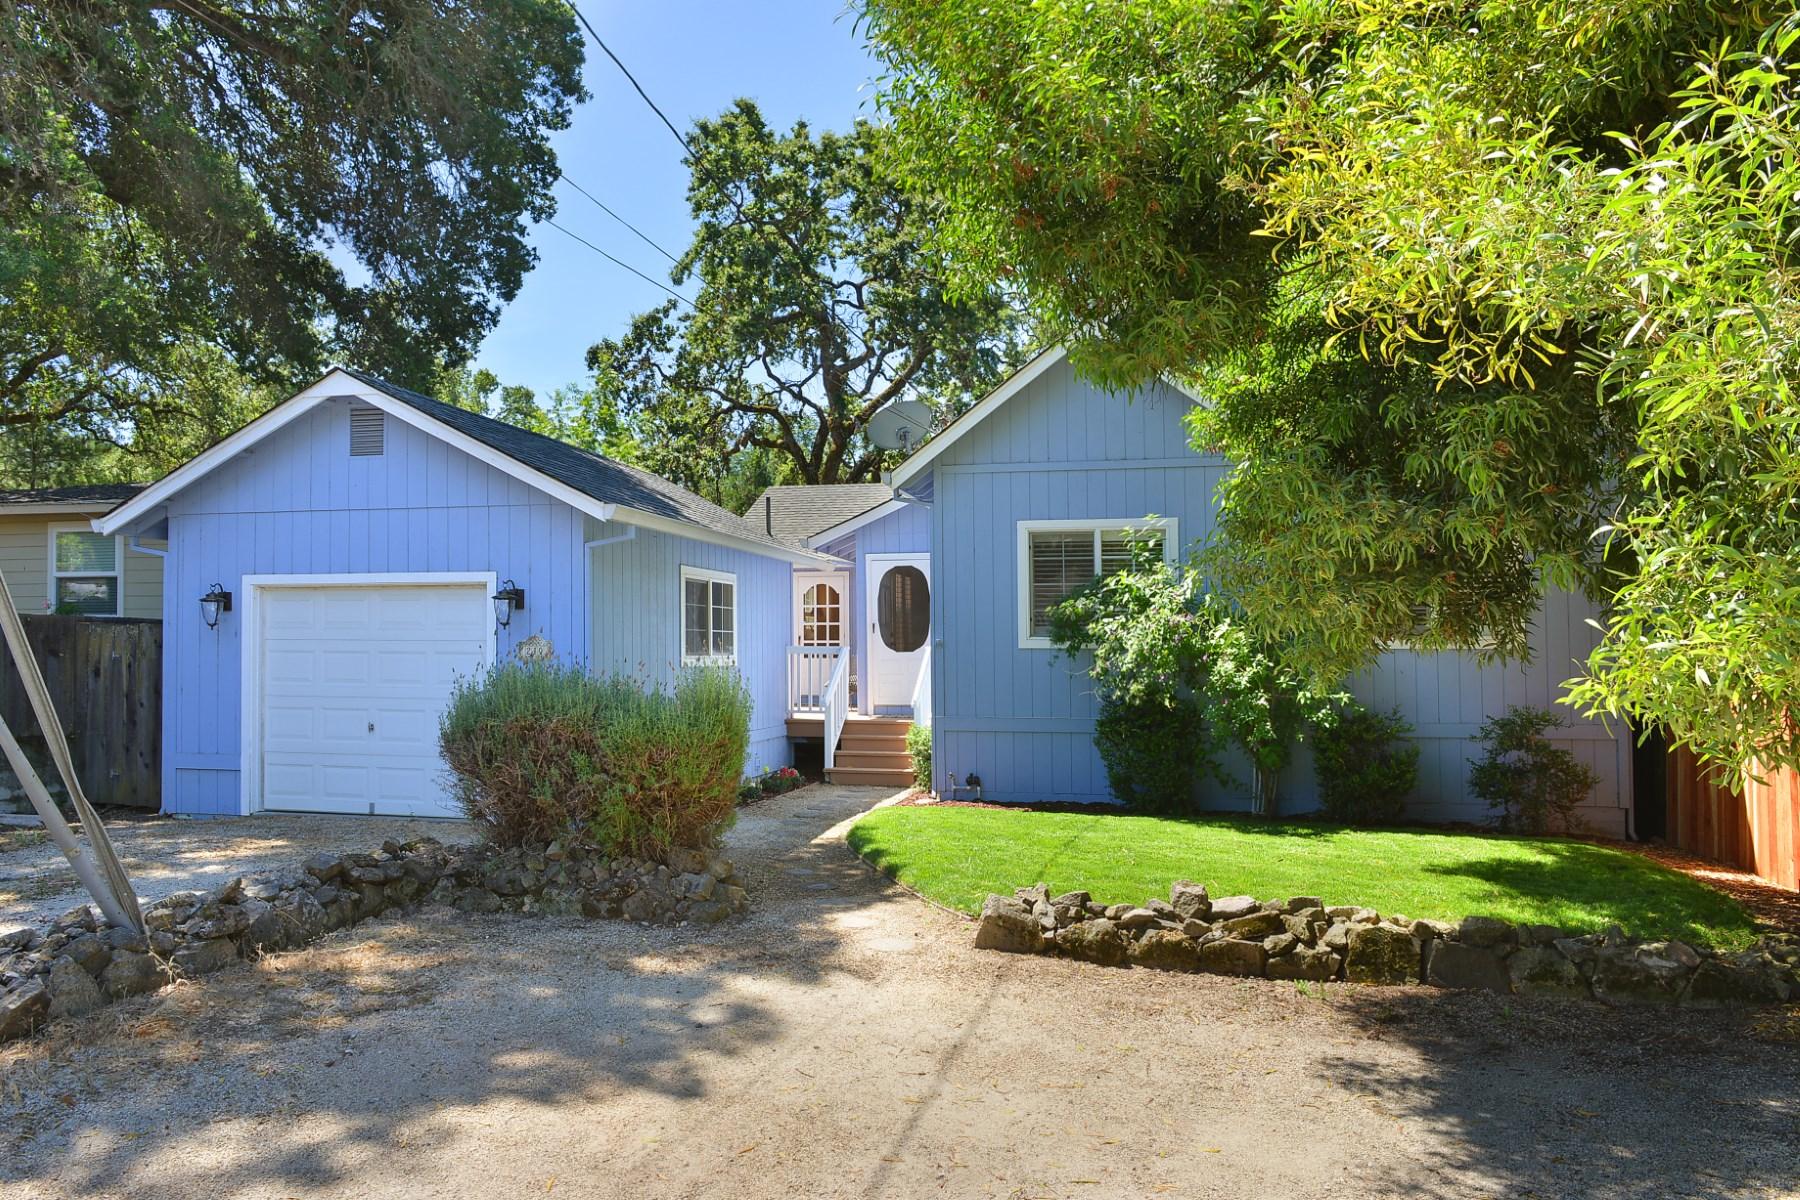 Single Family Home for Sale at Mountain Avenue Gem 210 Mountain Ave Sonoma, California, 95476 United States